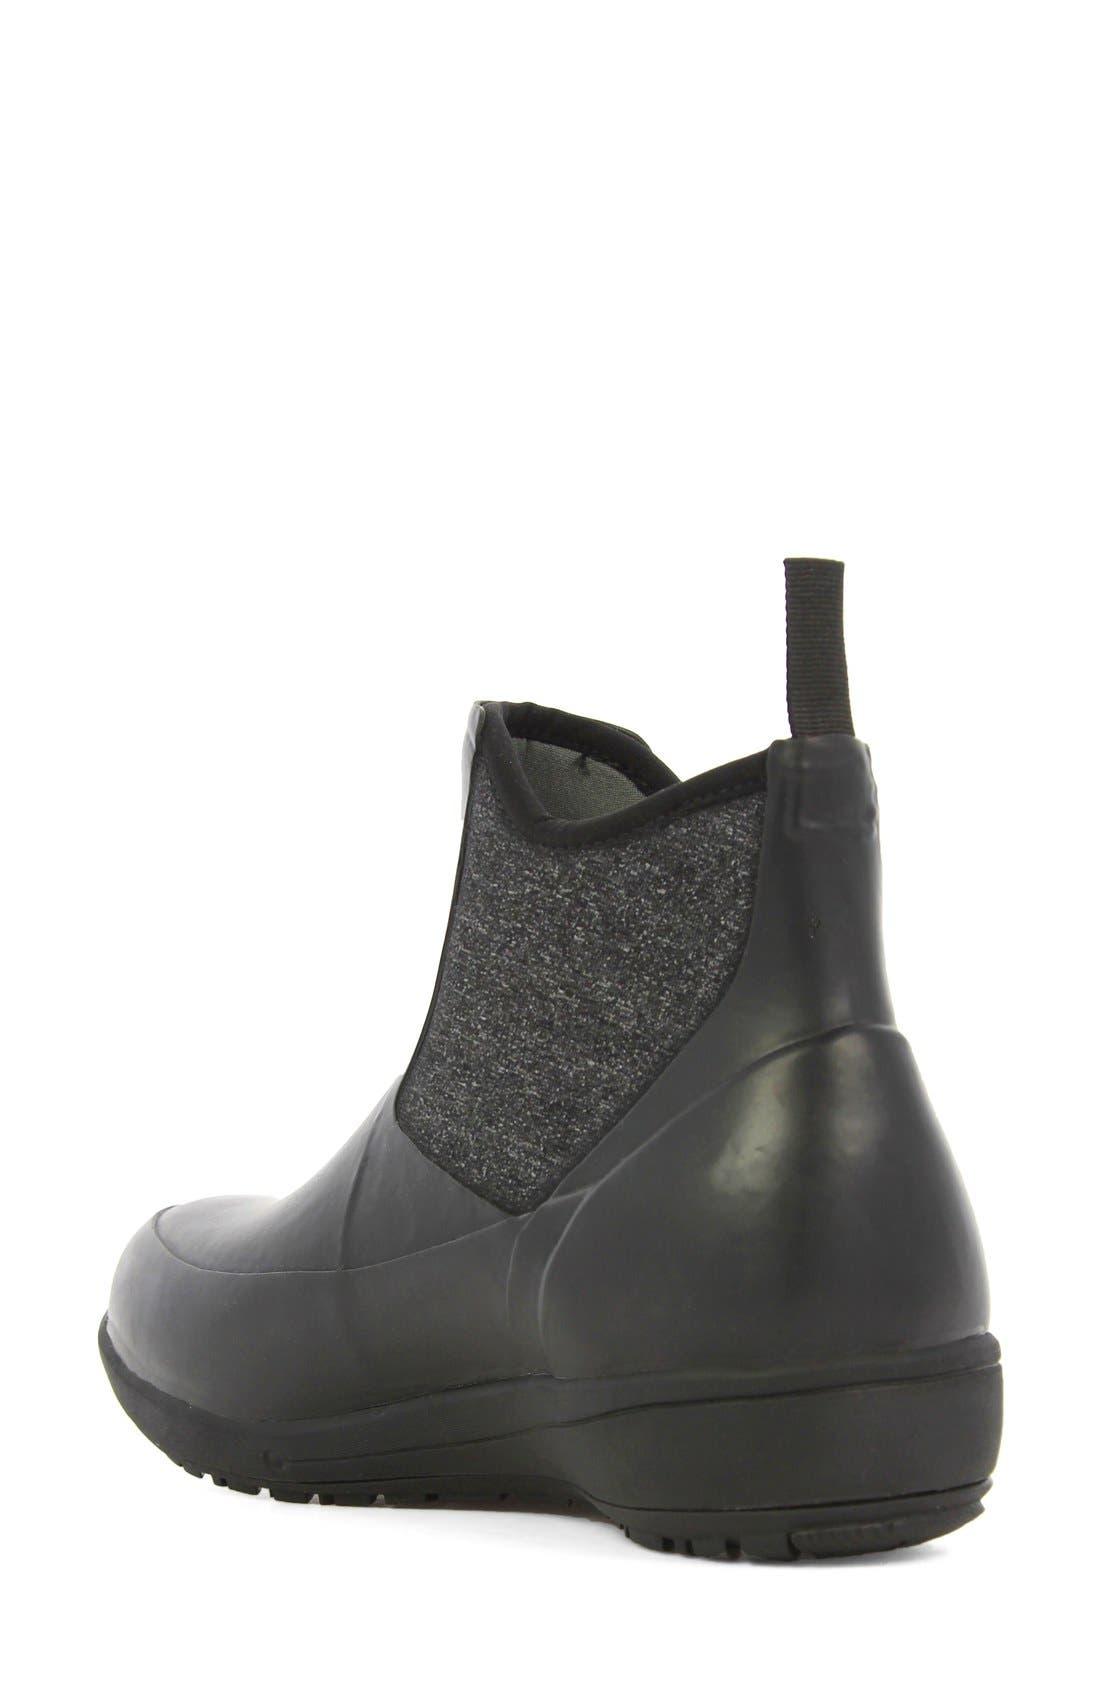 'Cami' Waterproof Short Boot,                             Alternate thumbnail 2, color,                             001